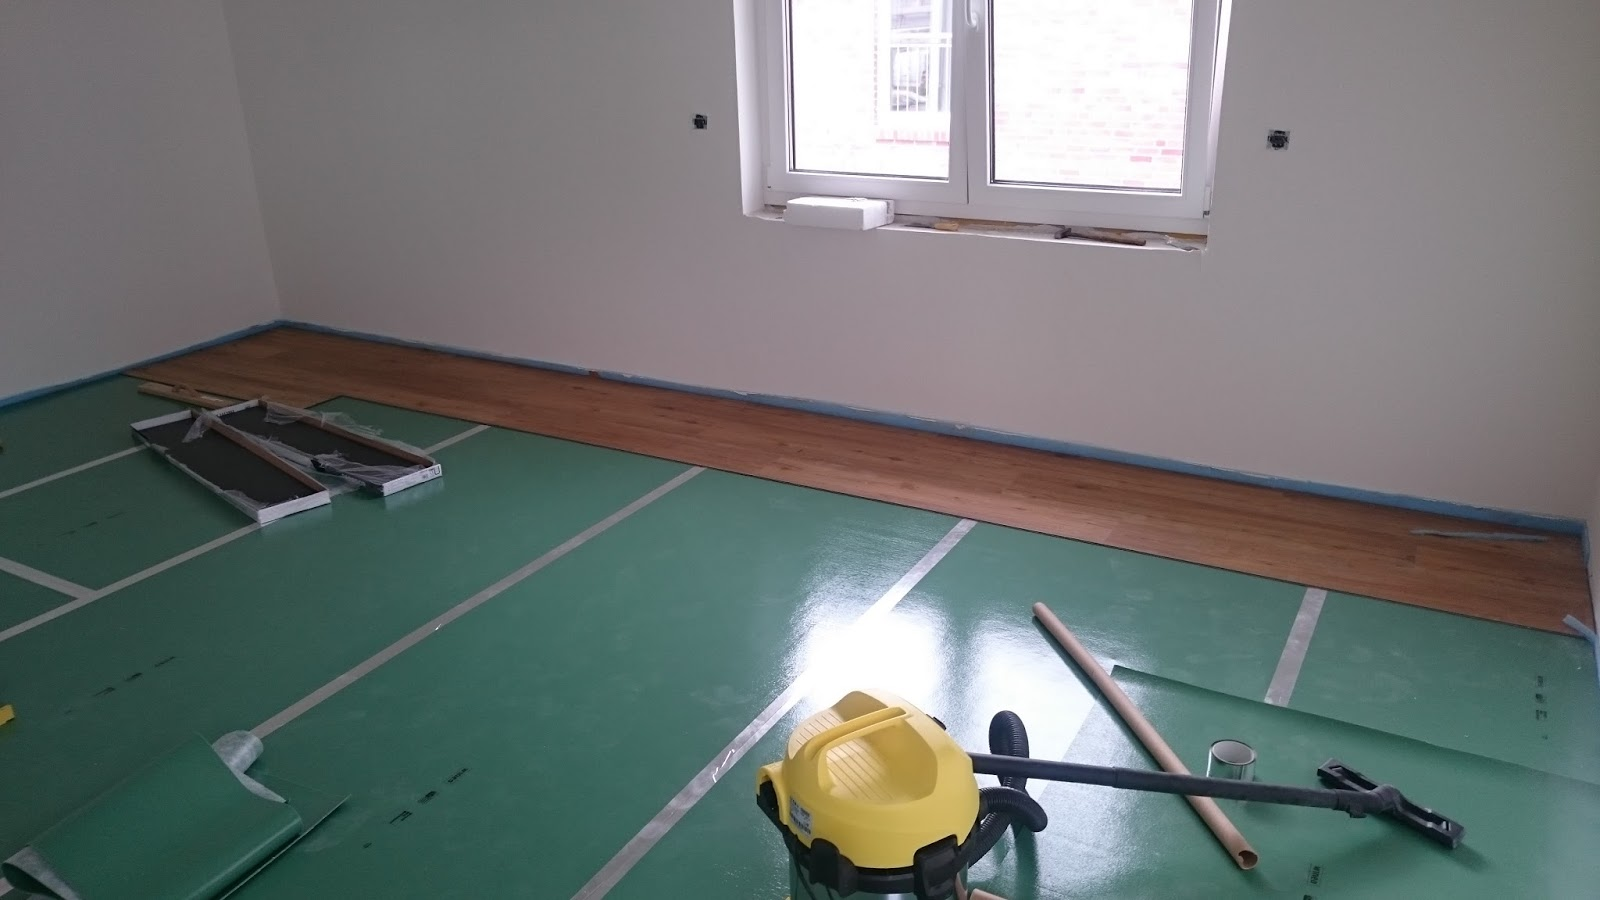 Holzfußboden Aufbau Altbau ~ Design fußboden verlegen altbau holzboden aufbau wohn design